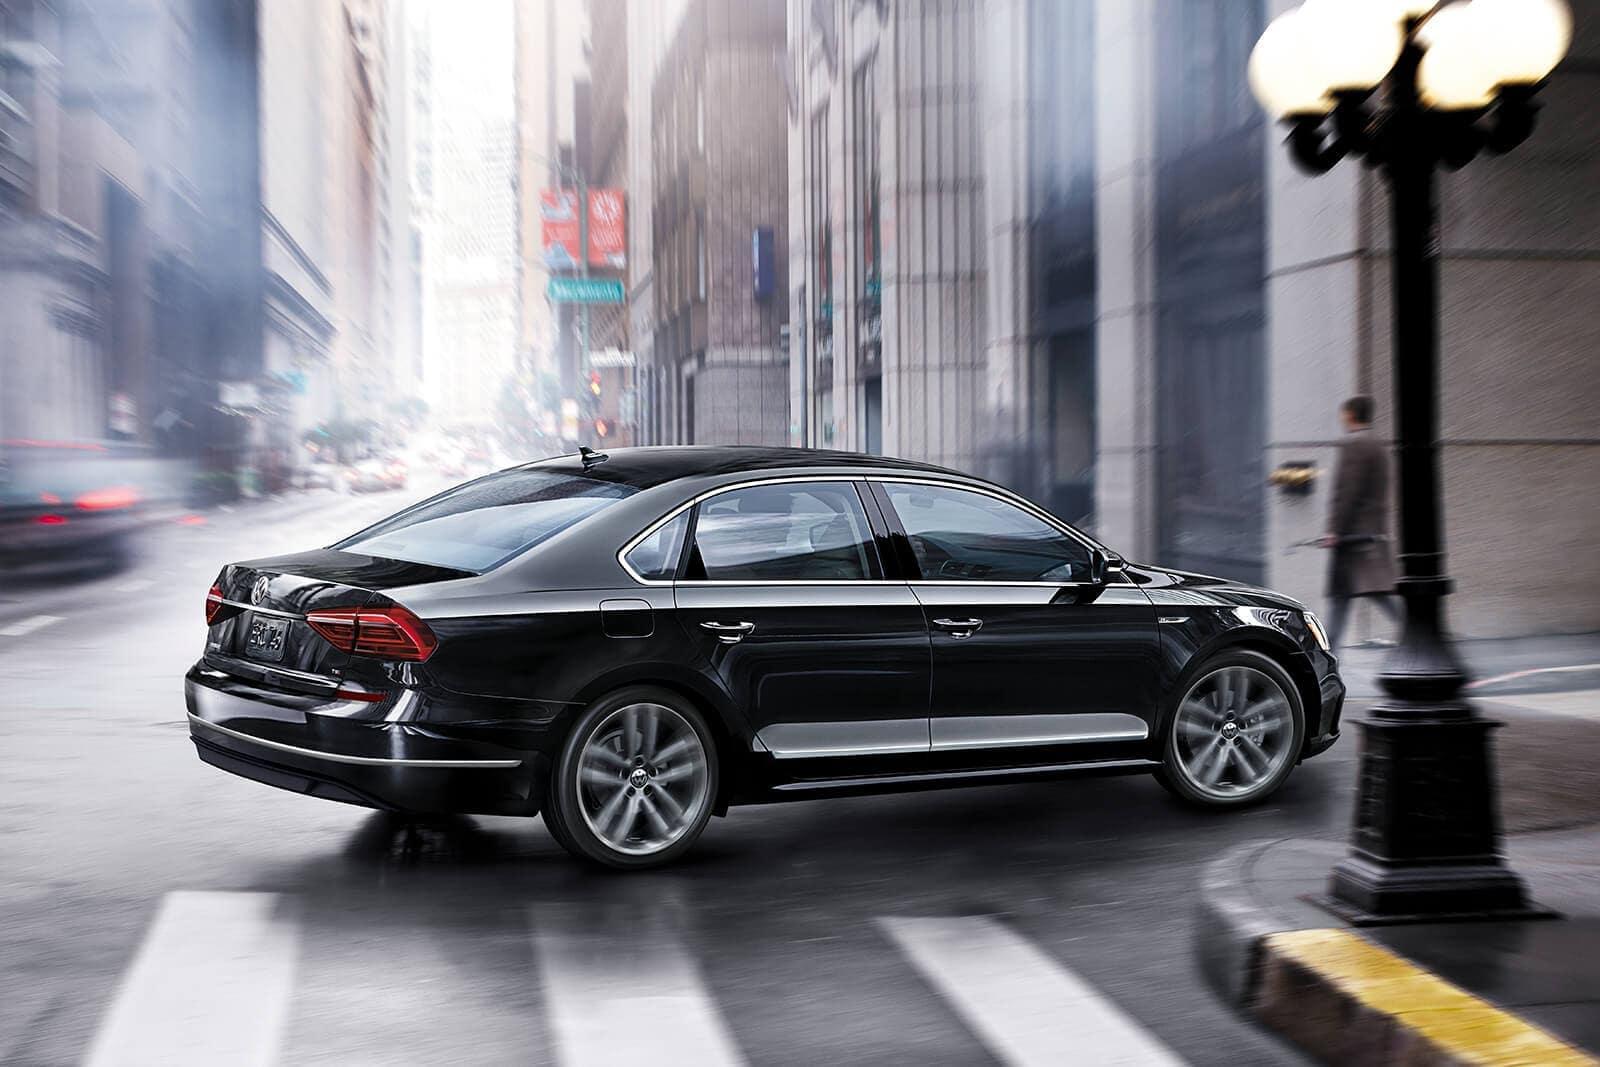 2019 Volkswagen Passat in black turning right